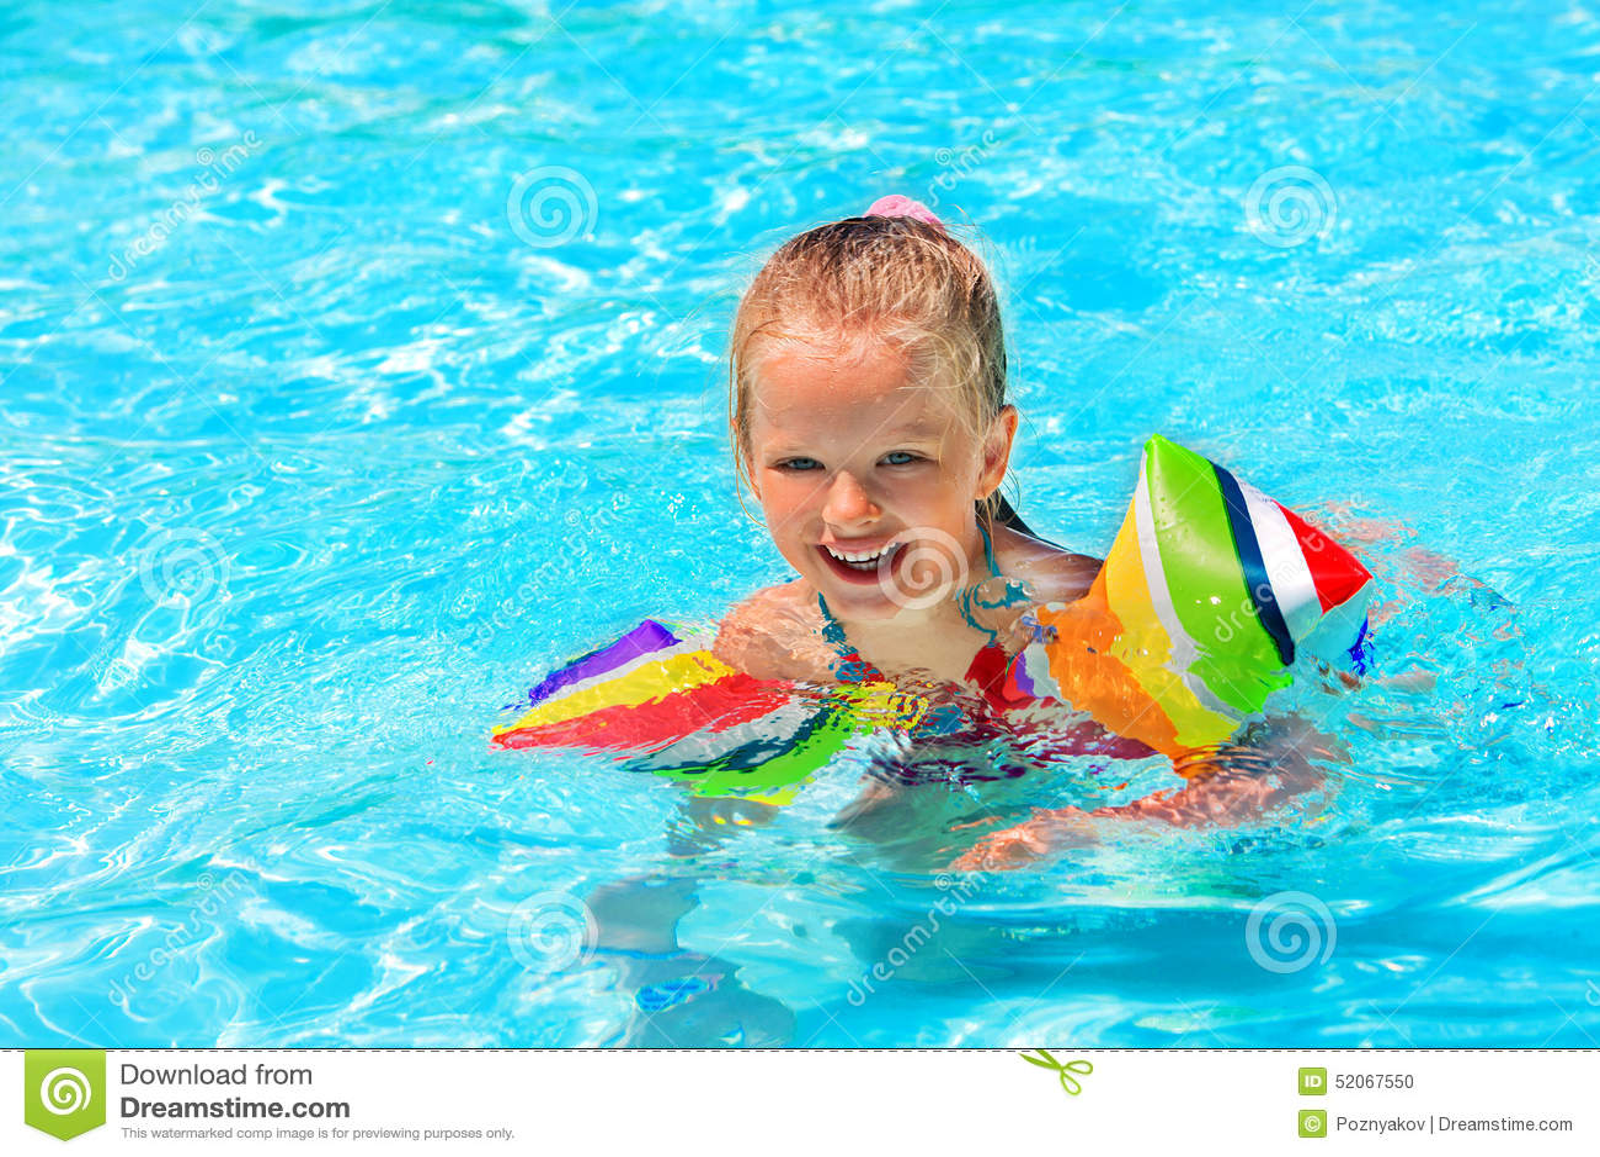 Enfant avec des brassards dans la piscine photo stock for Brassards piscine